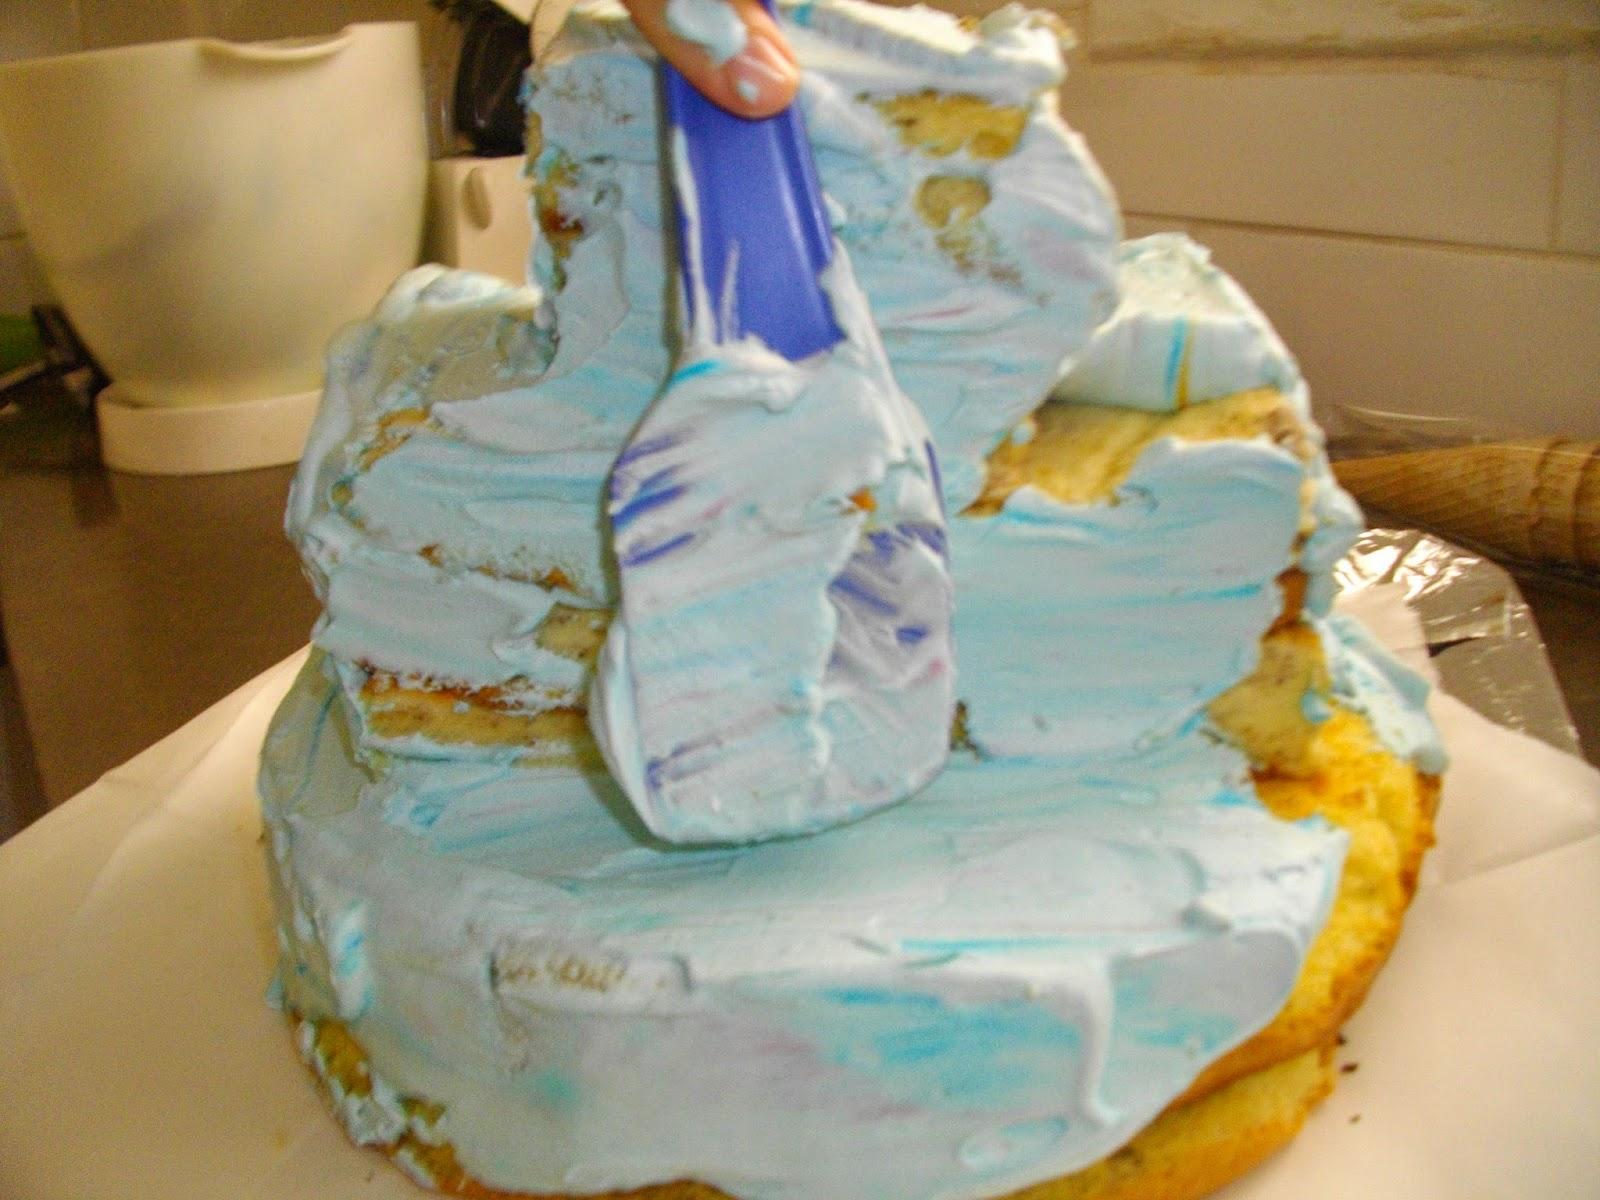 IMGP2866 - עוגת יומולדת בצורת ארמון